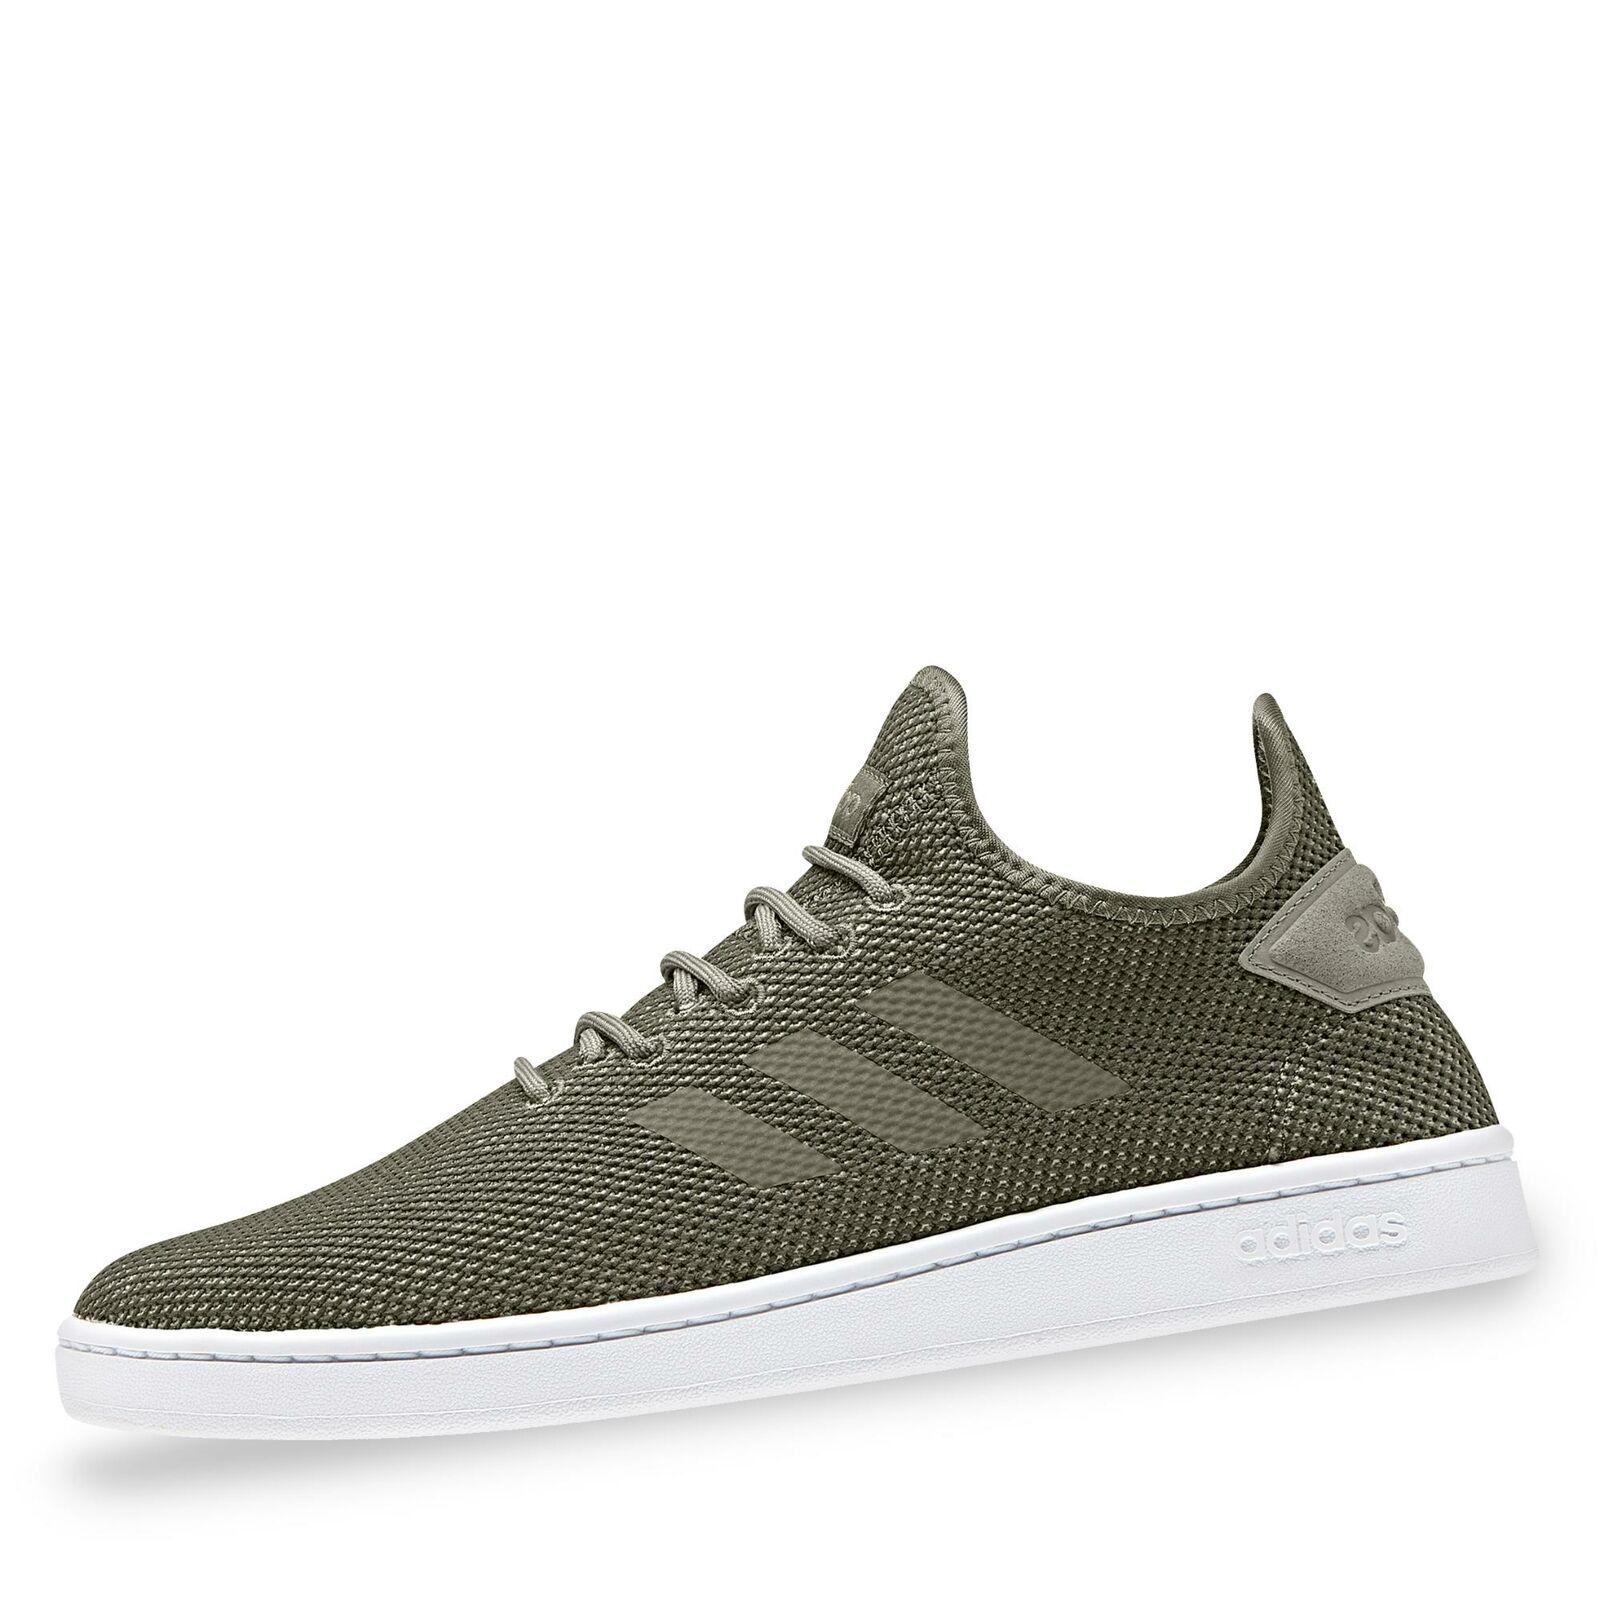 Adidas Court Adapt Herren Turnschuhe Turnschuhe Sportschuhe Laufschuhe Schuhe khaki